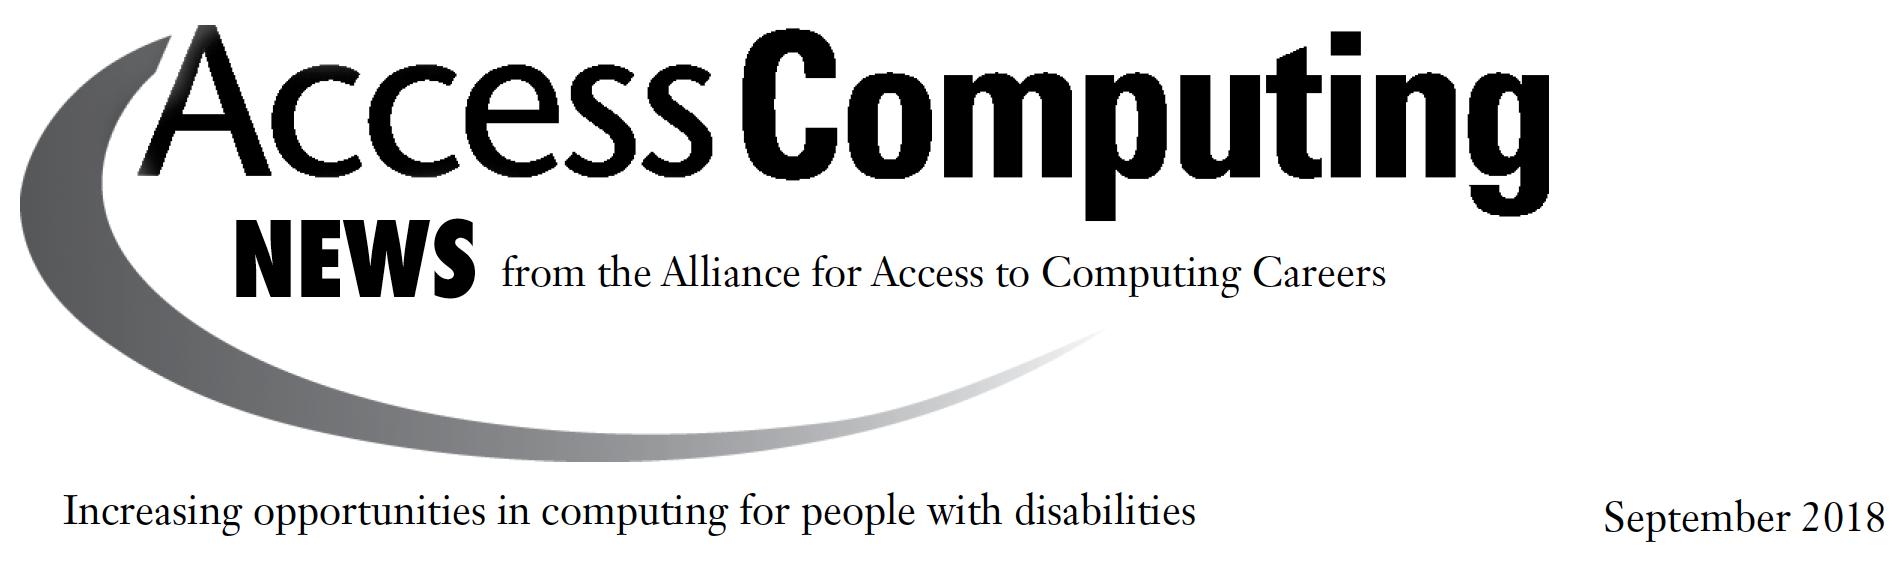 AccessComputing News September 2018 Header